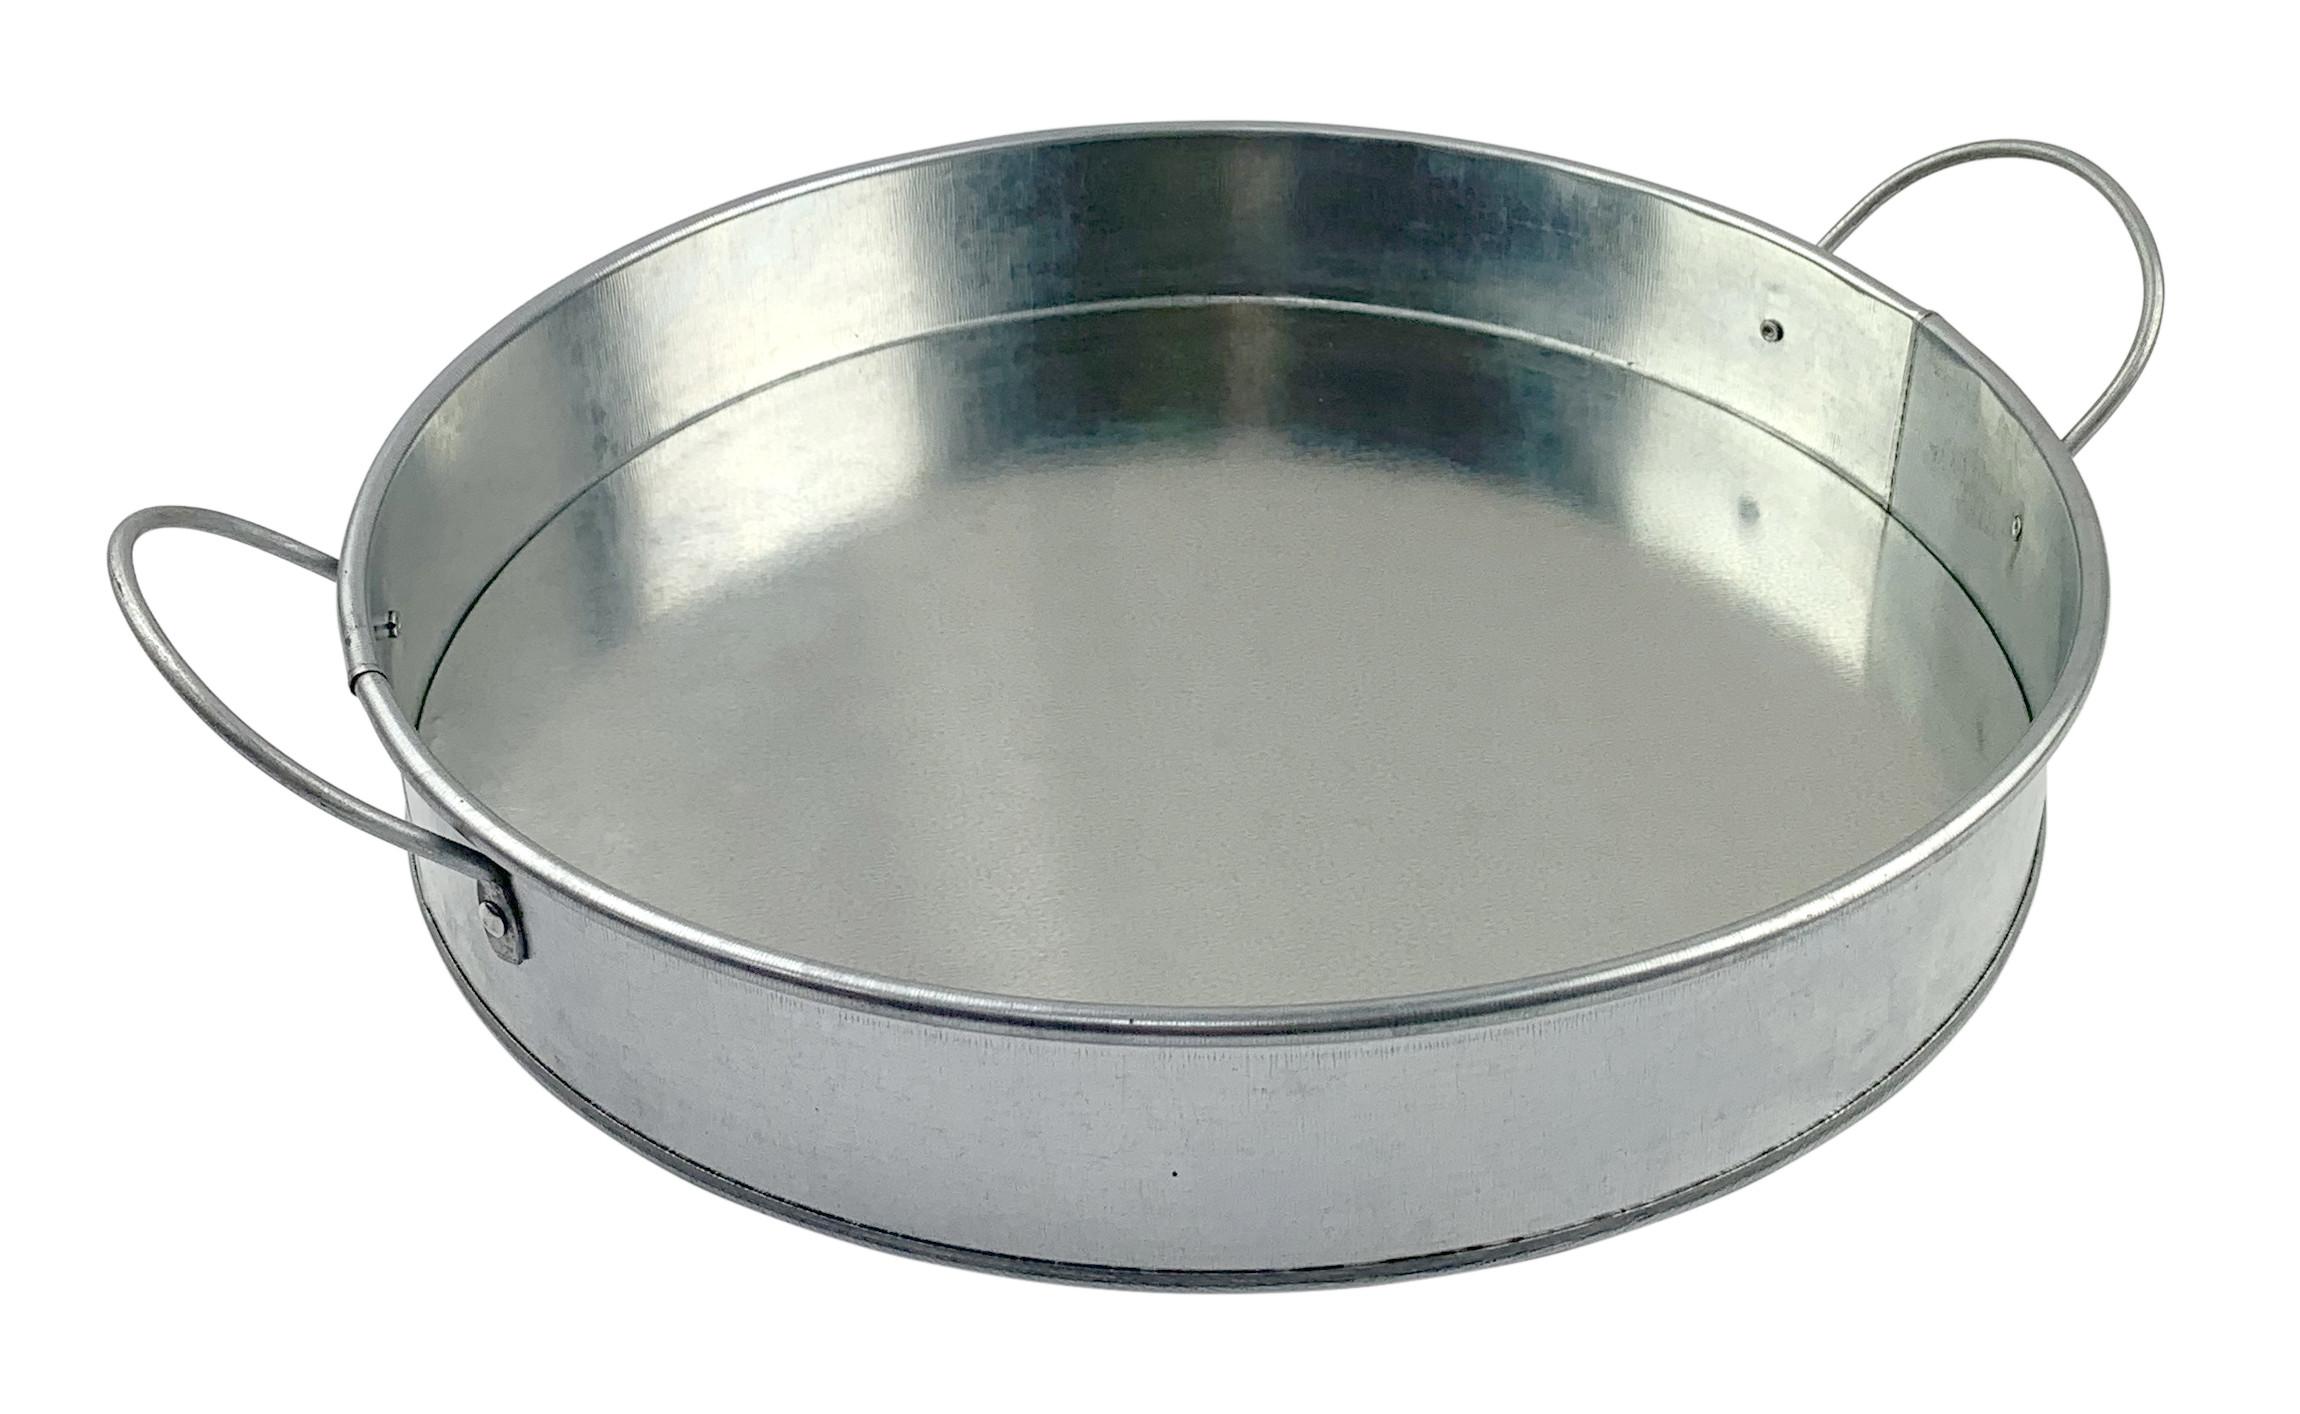 Serverings-bakke-platte-stål-krom-mixmeister.dk-mad